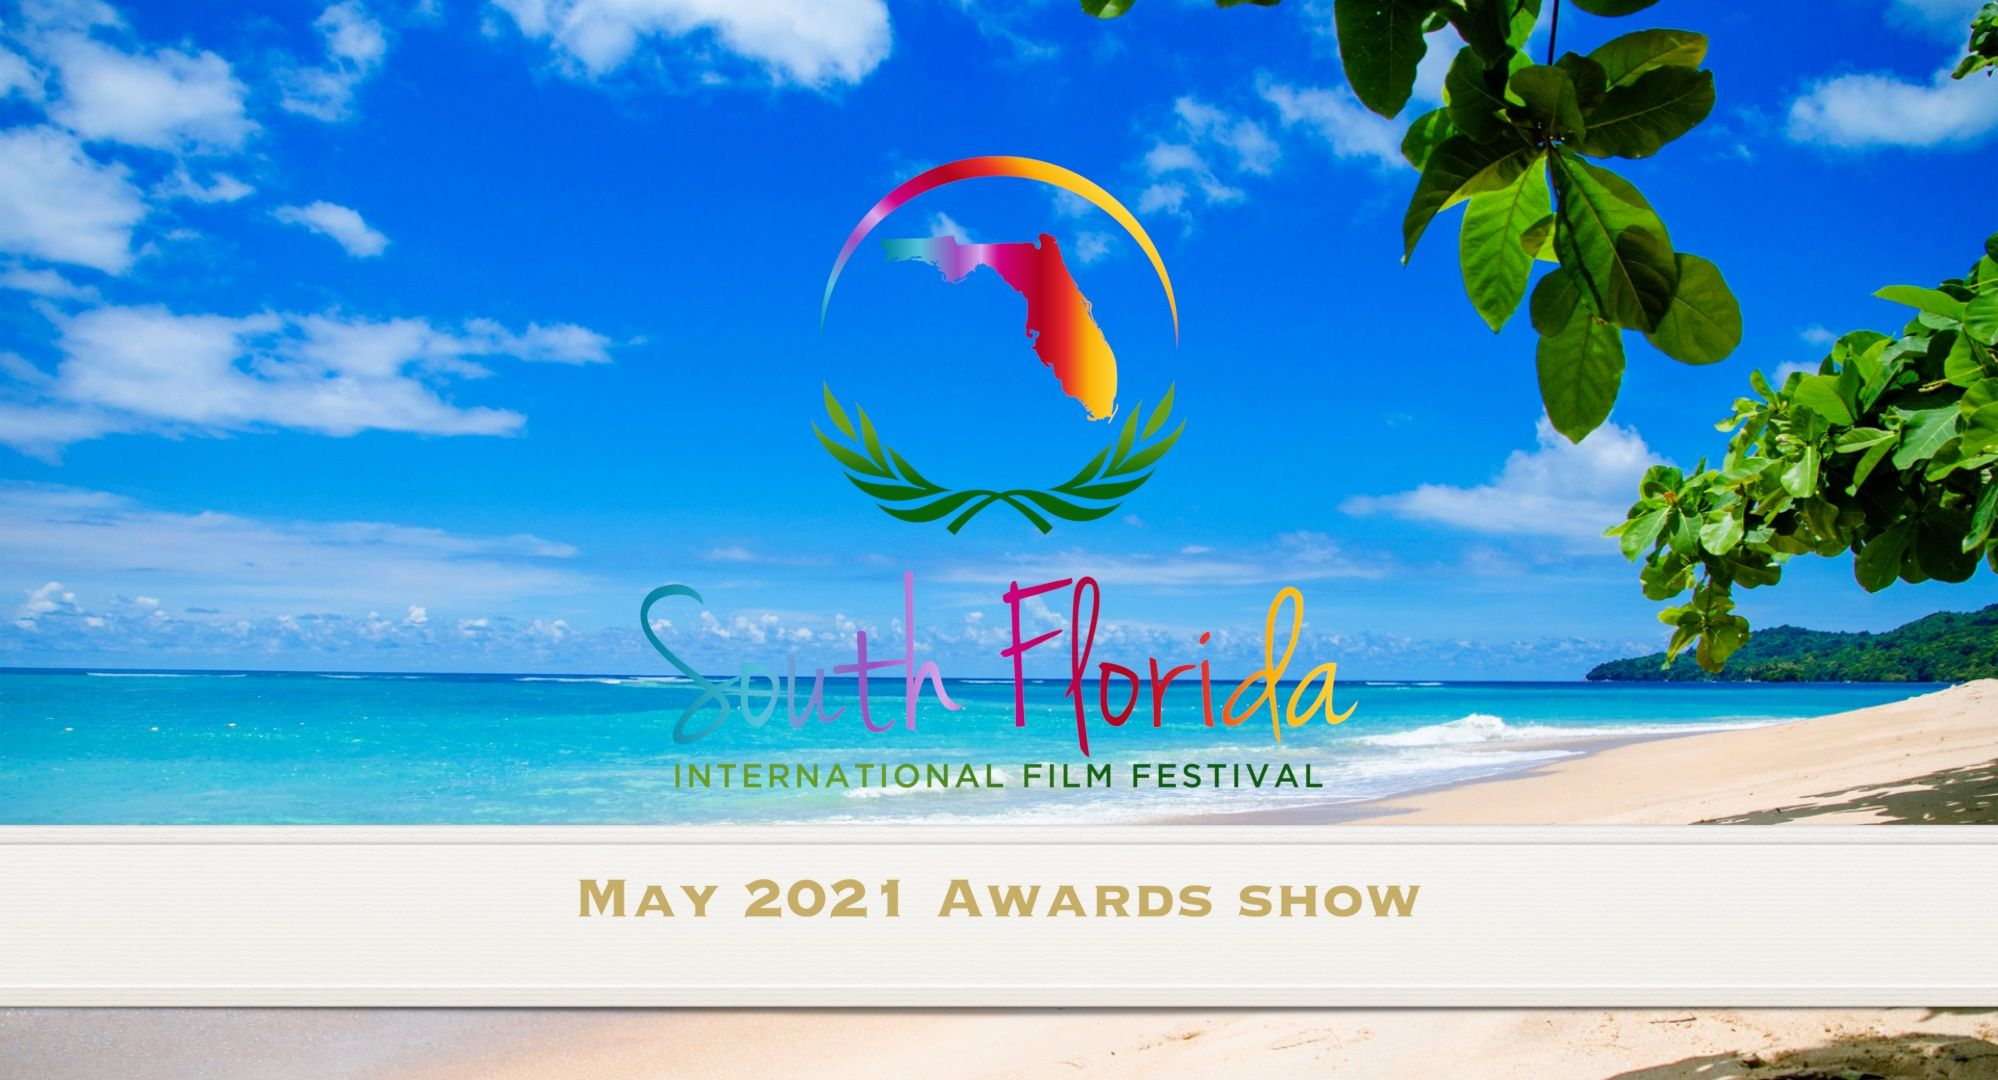 May 2021 South Florida International Film Festival